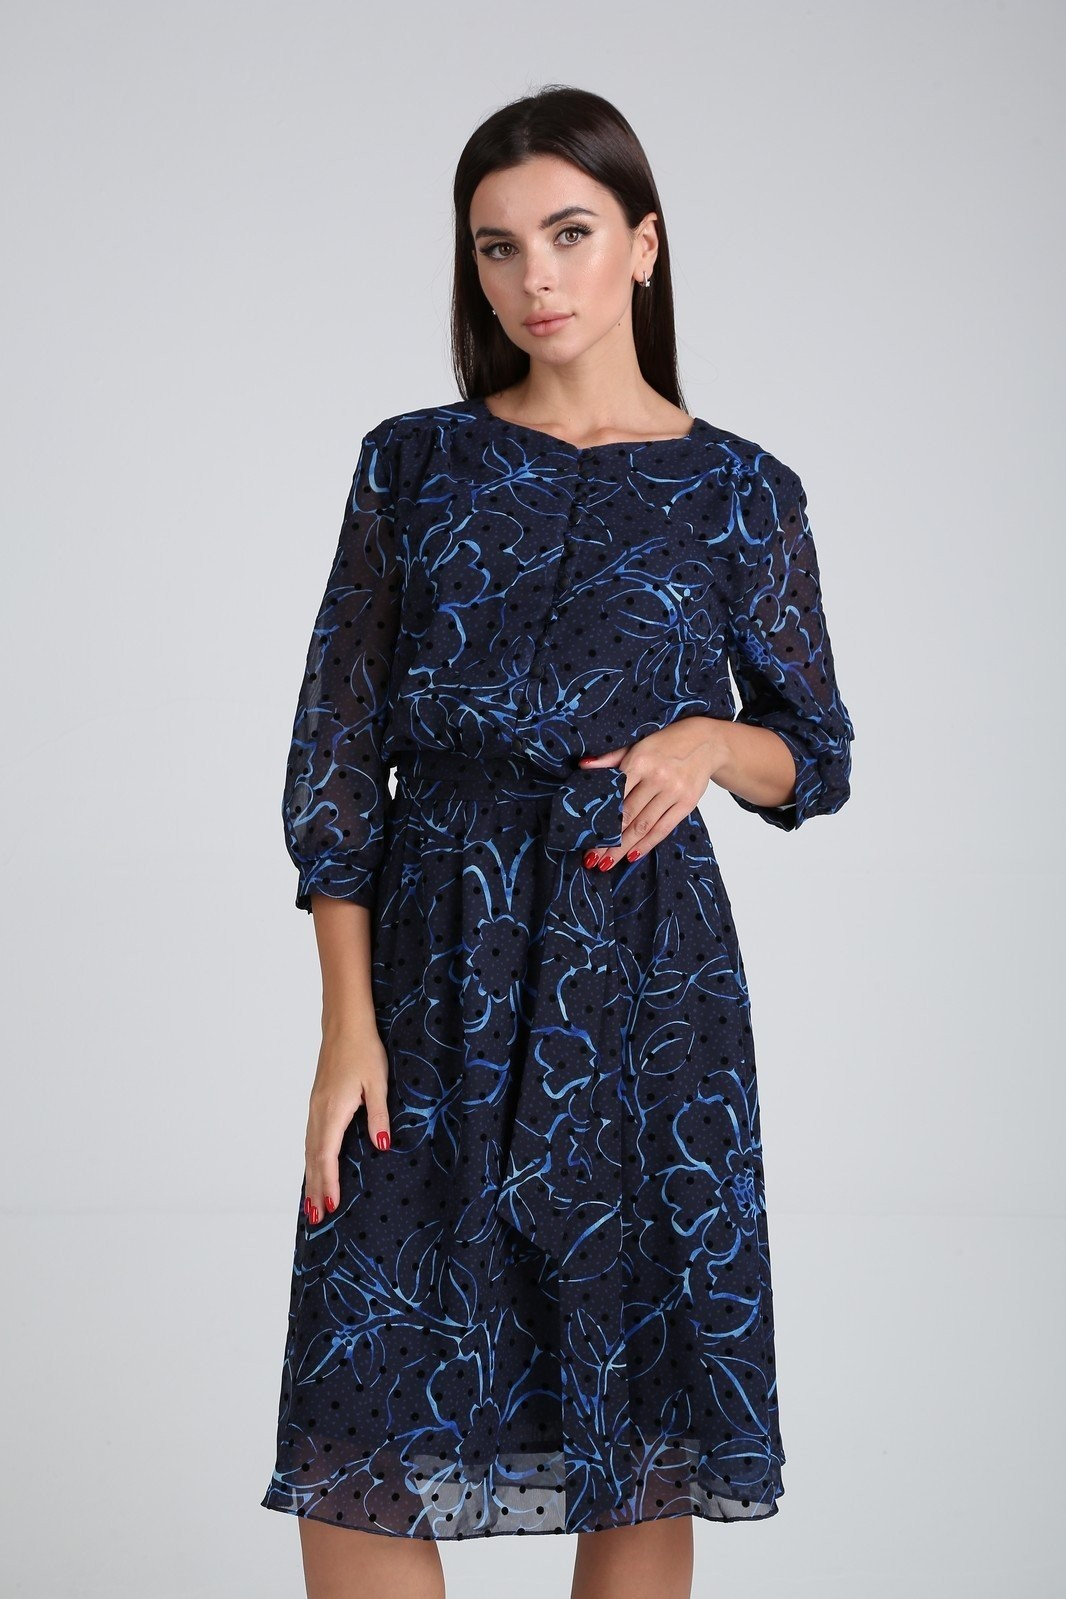 Платье Мода-Версаль 2318 синий